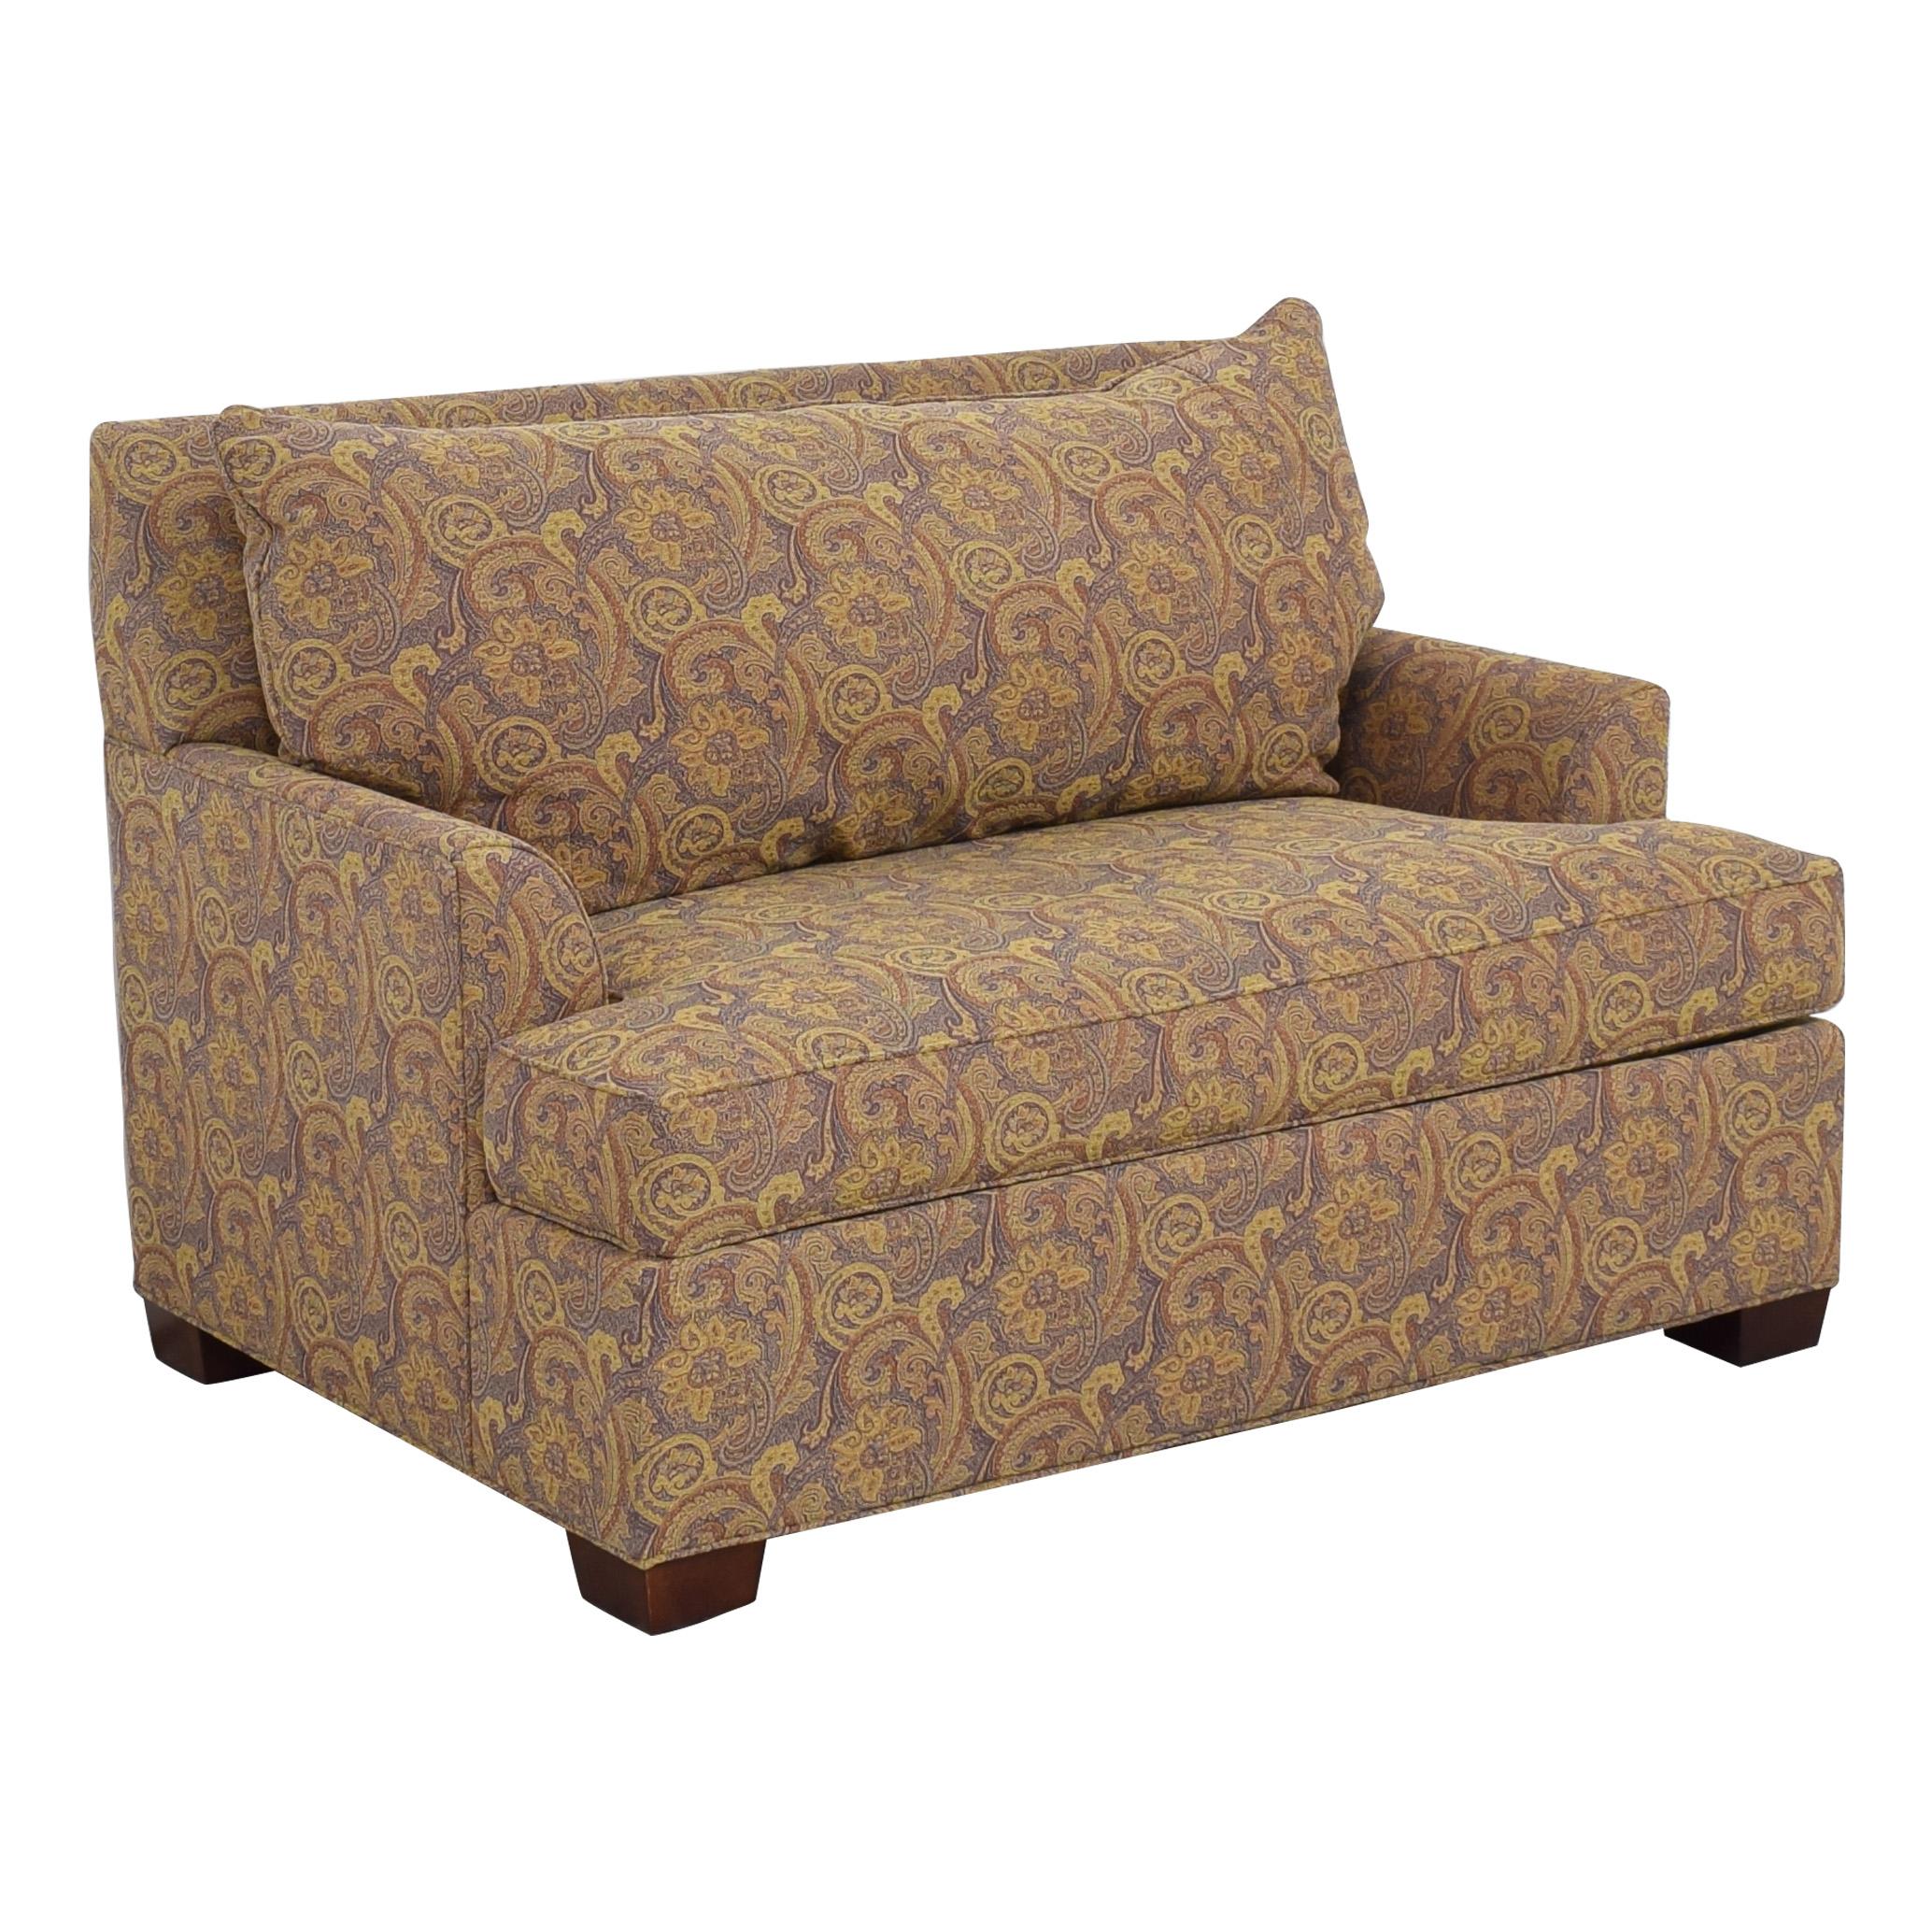 Ethan Allen Ethan Allen Marina Chair and a Half Twin Sleeper with Ottoman